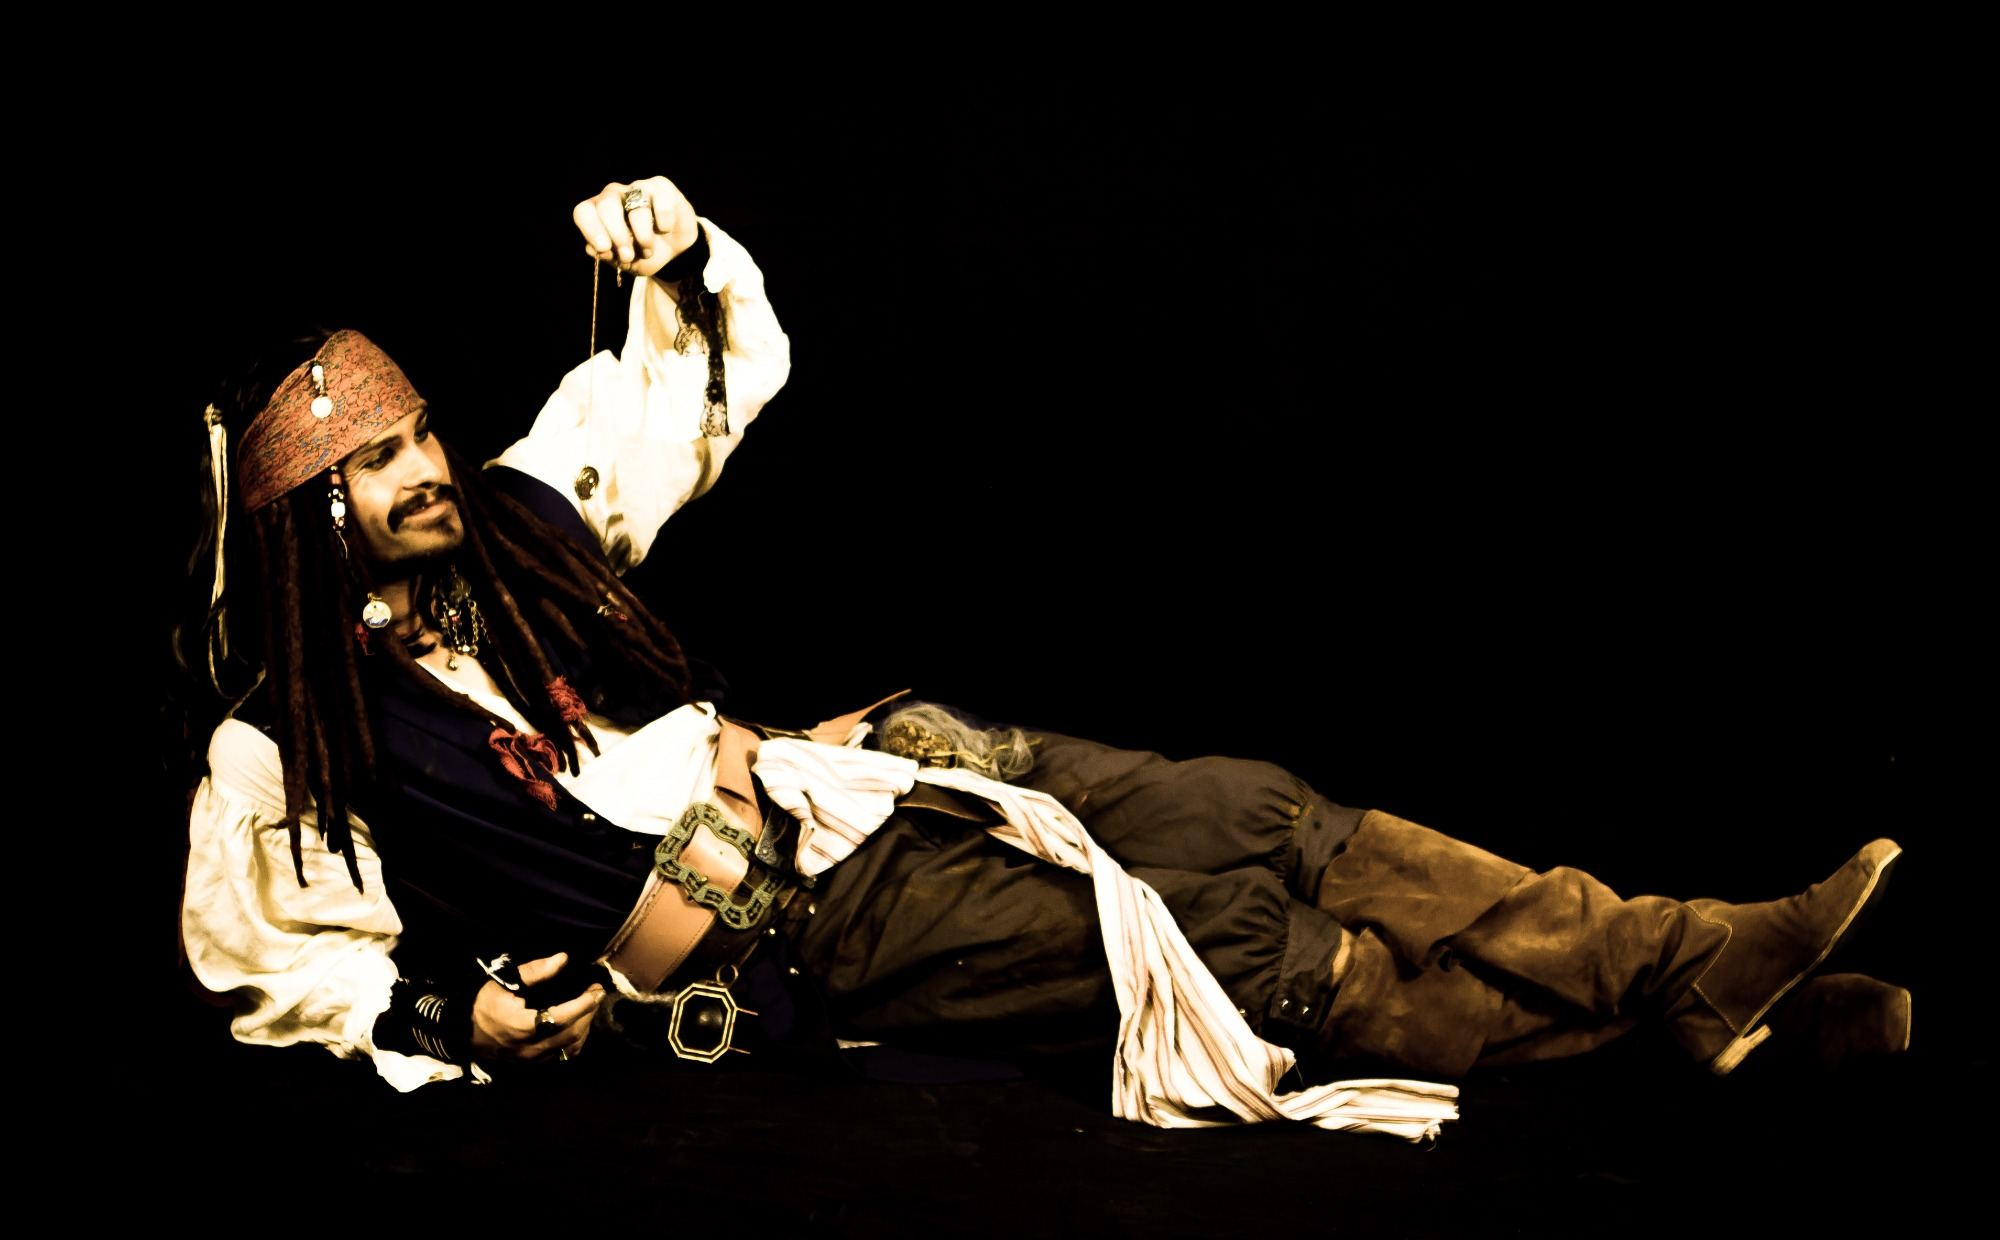 Promo Pirates of the Caribbean Lookalike Lookalike Gloucestershire